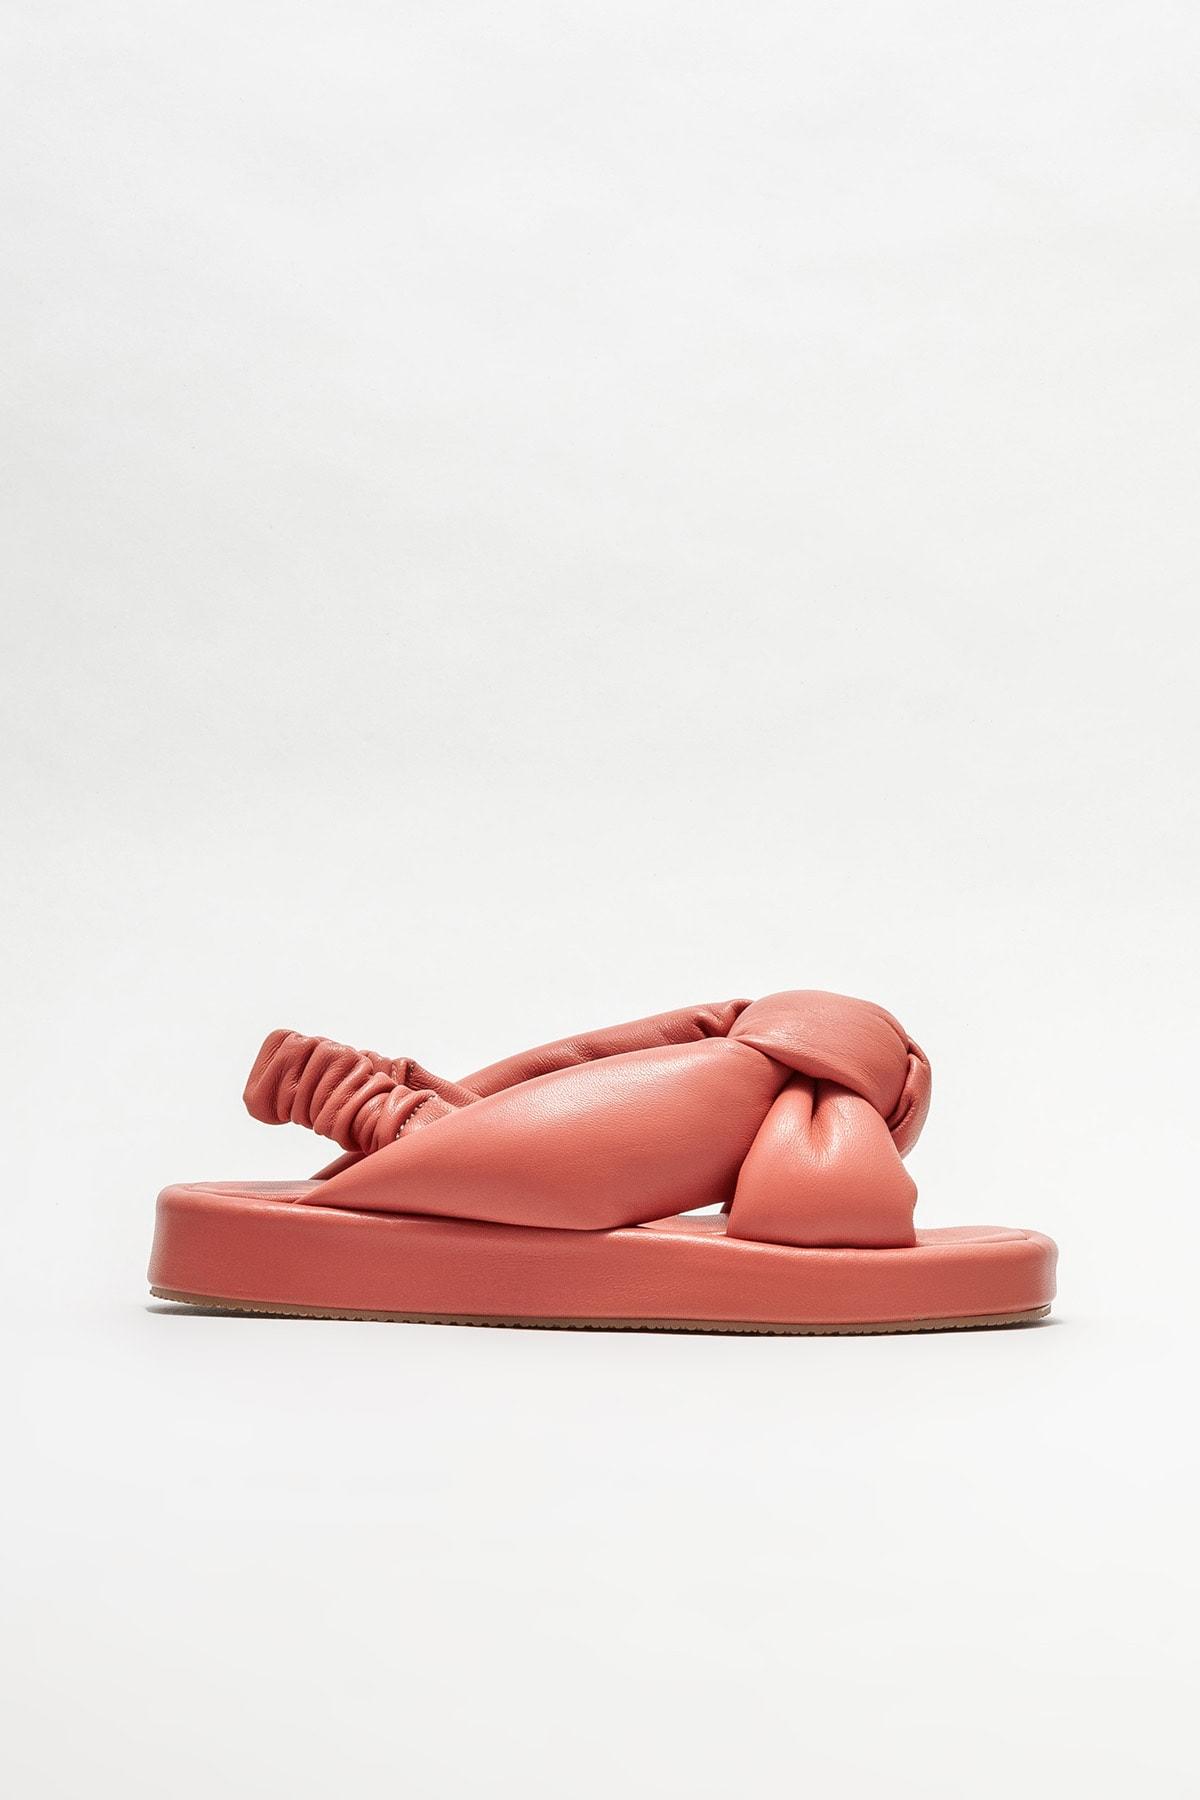 Deri Dolgu Topuklu Sandalet